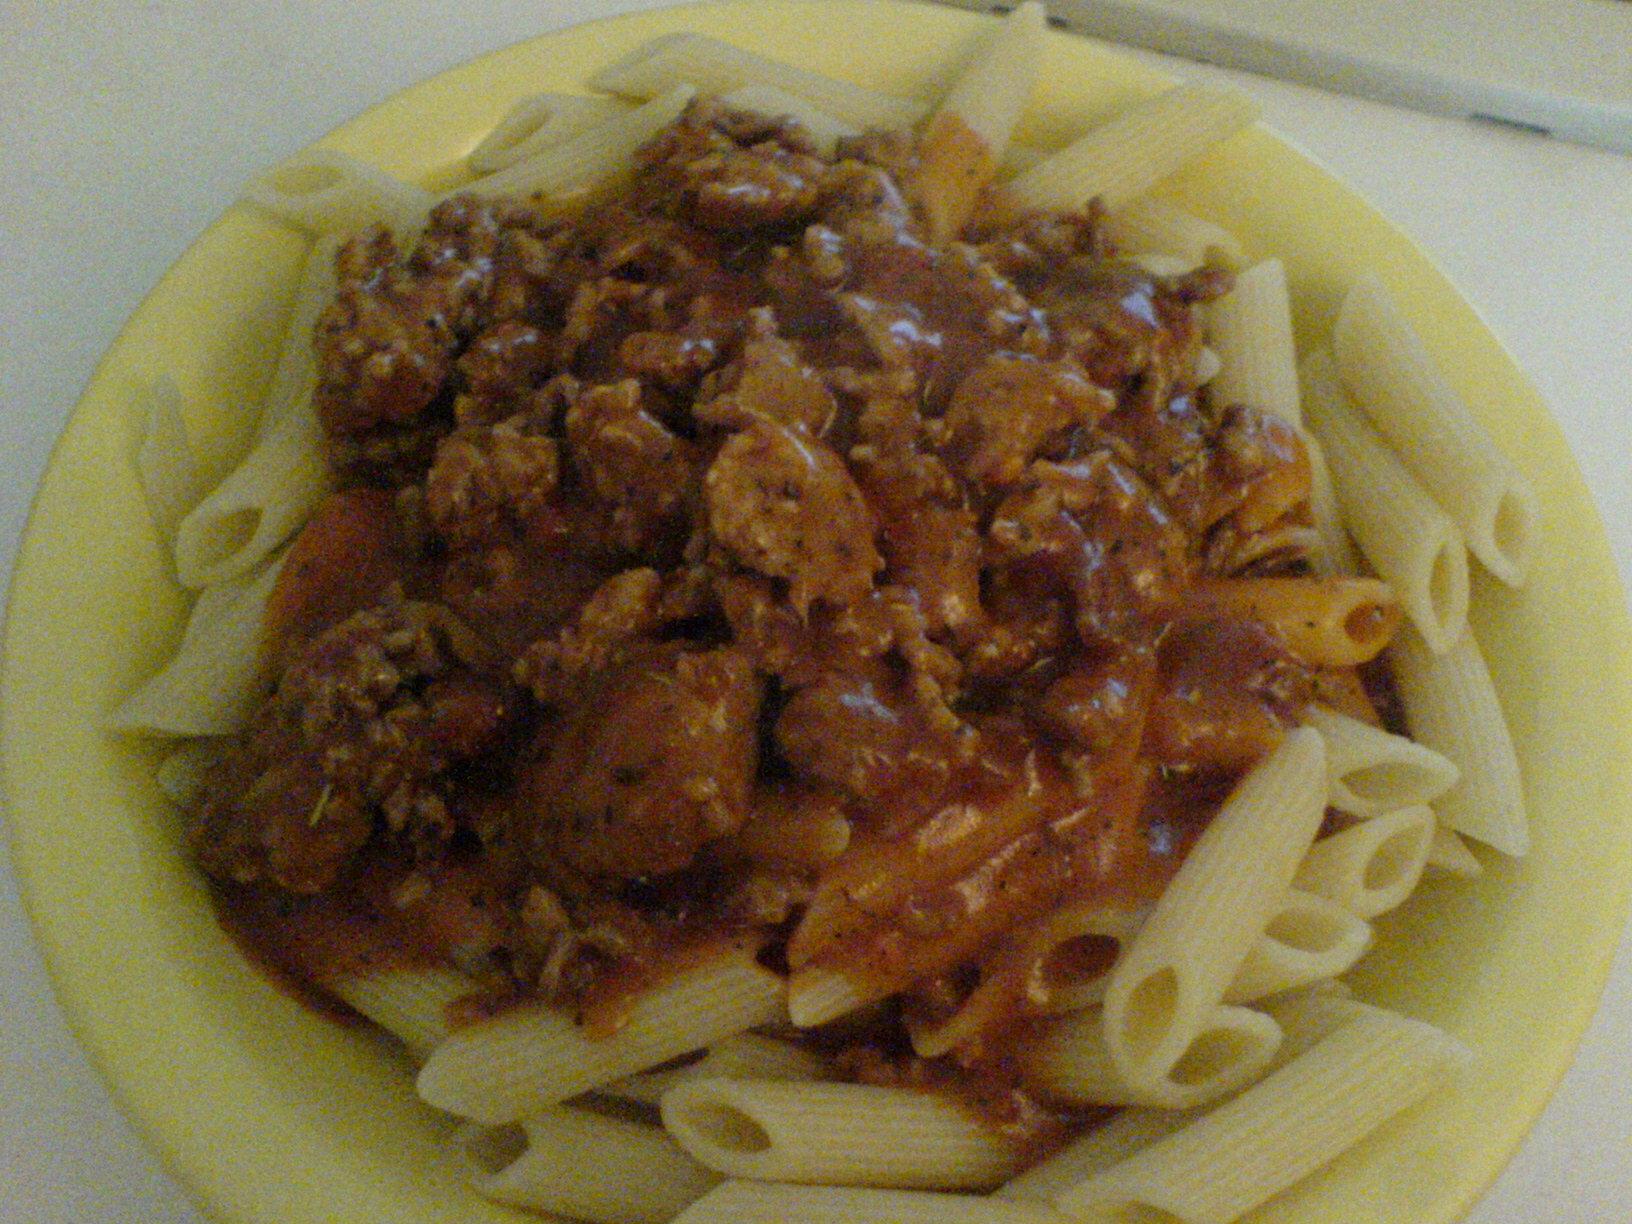 http://foodloader.net/makaVeLi_2008-09-10_Hasche_Nudeln.jpg